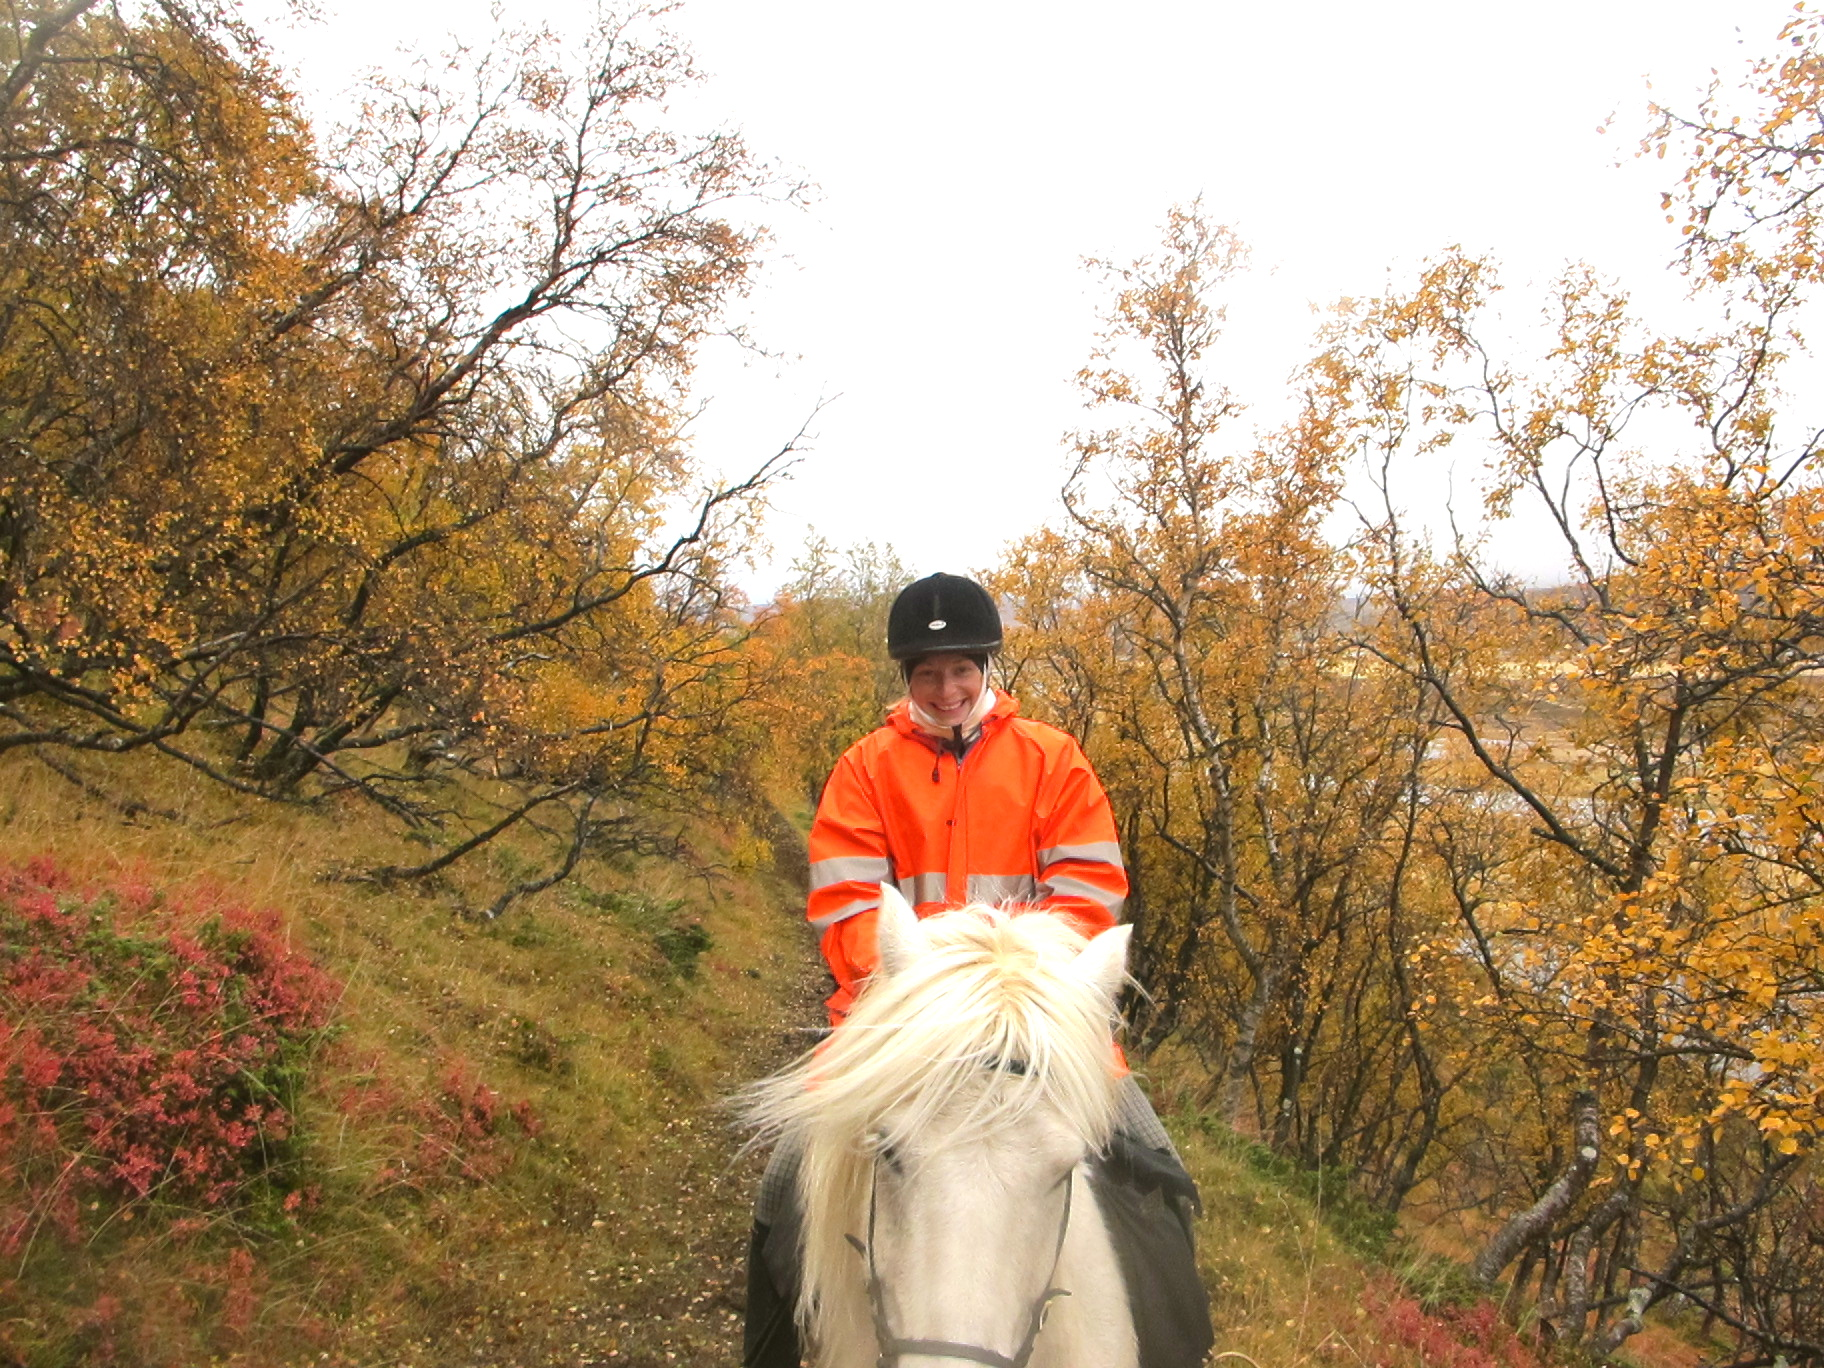 ridetur island hest